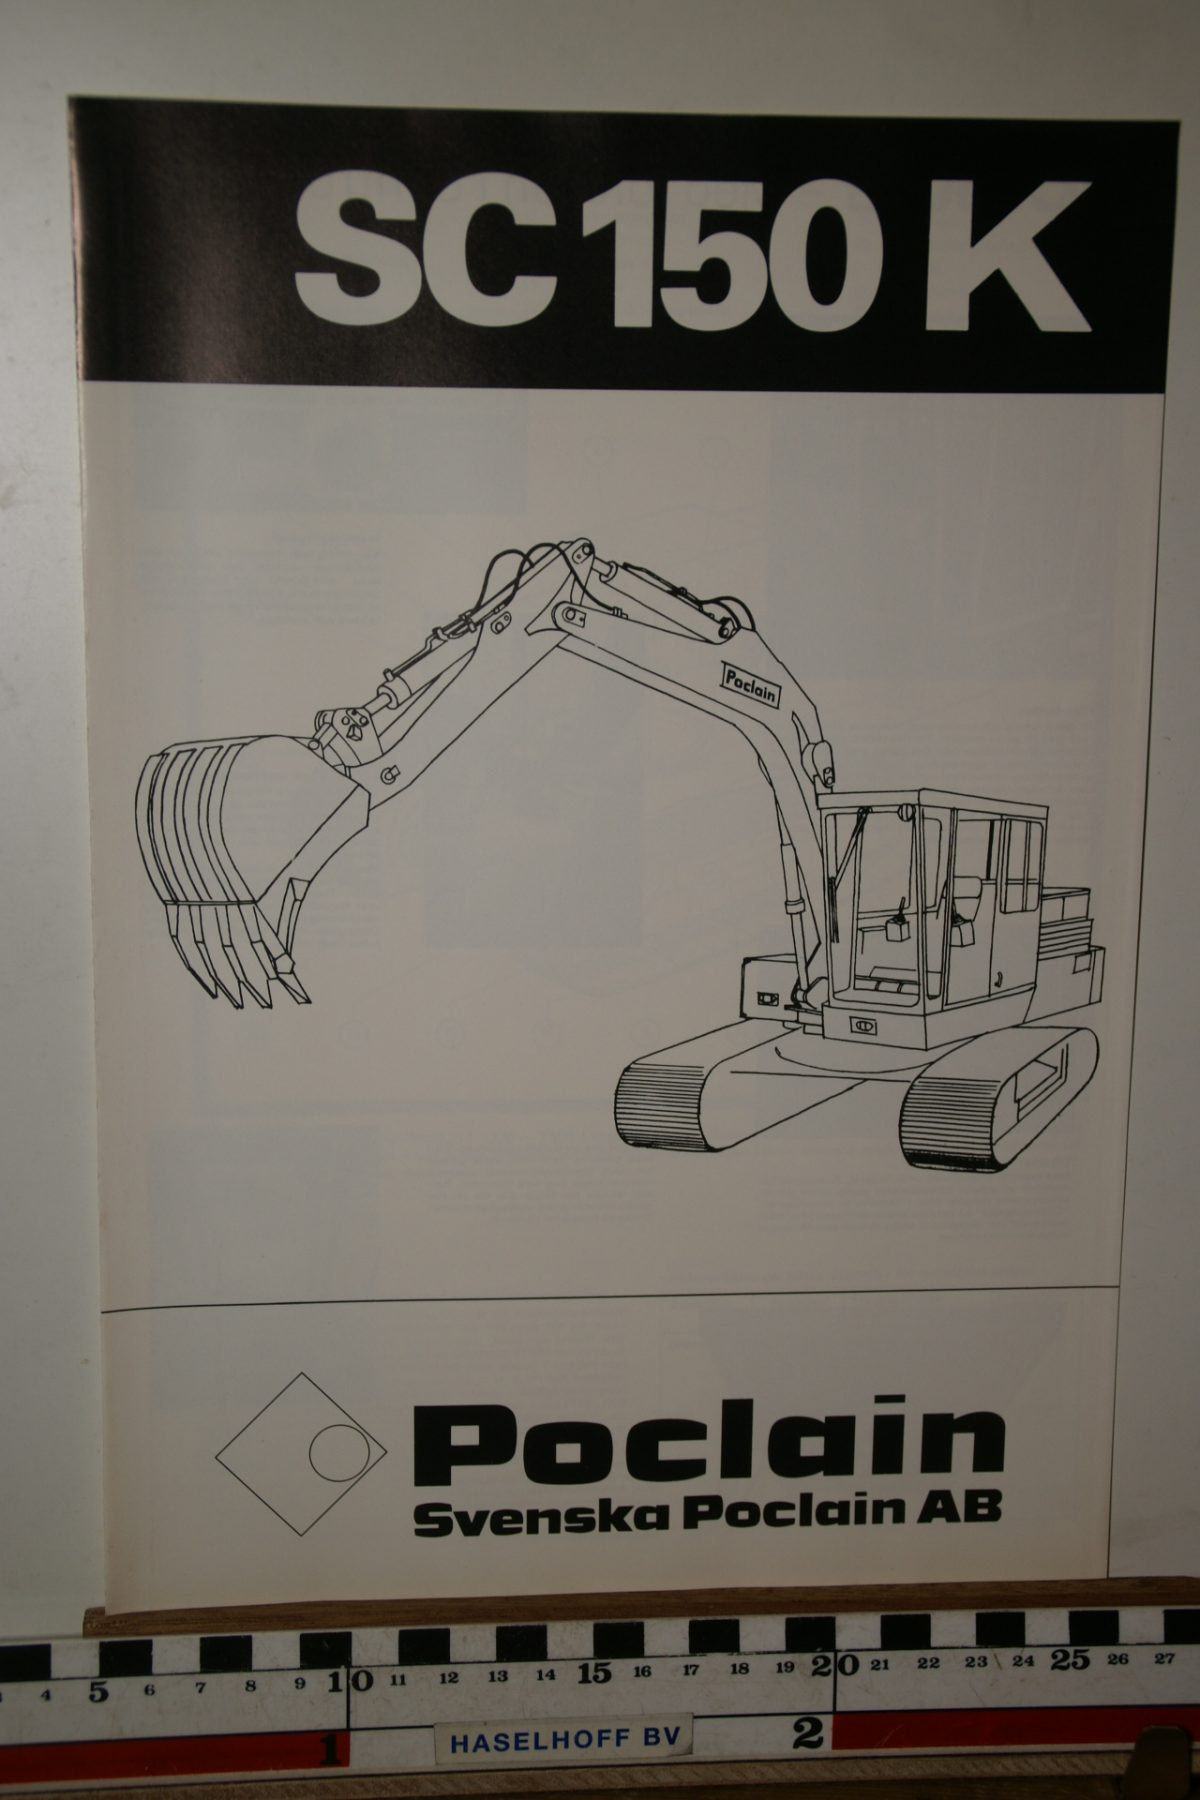 DSC02588 1973 brochure Poclain SC150K